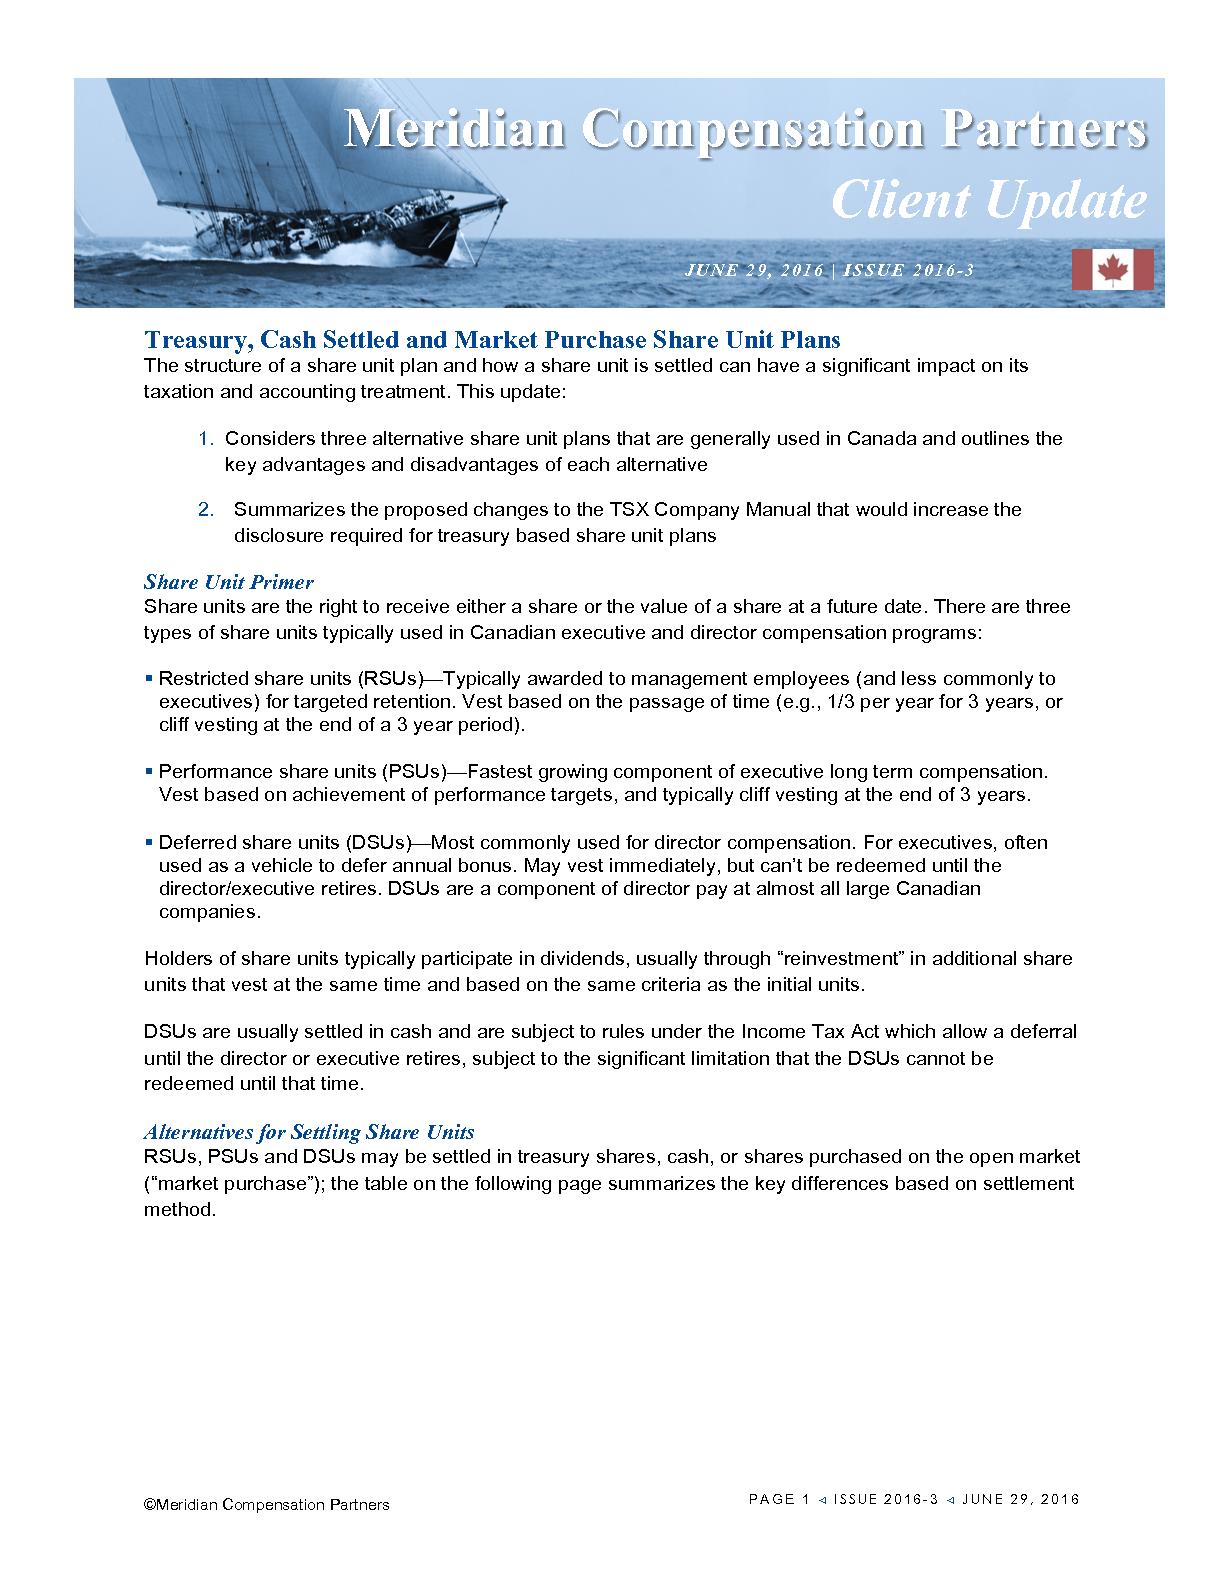 Treasury, Cash Settled and Market Purchase Share Unit Plans (PDF)